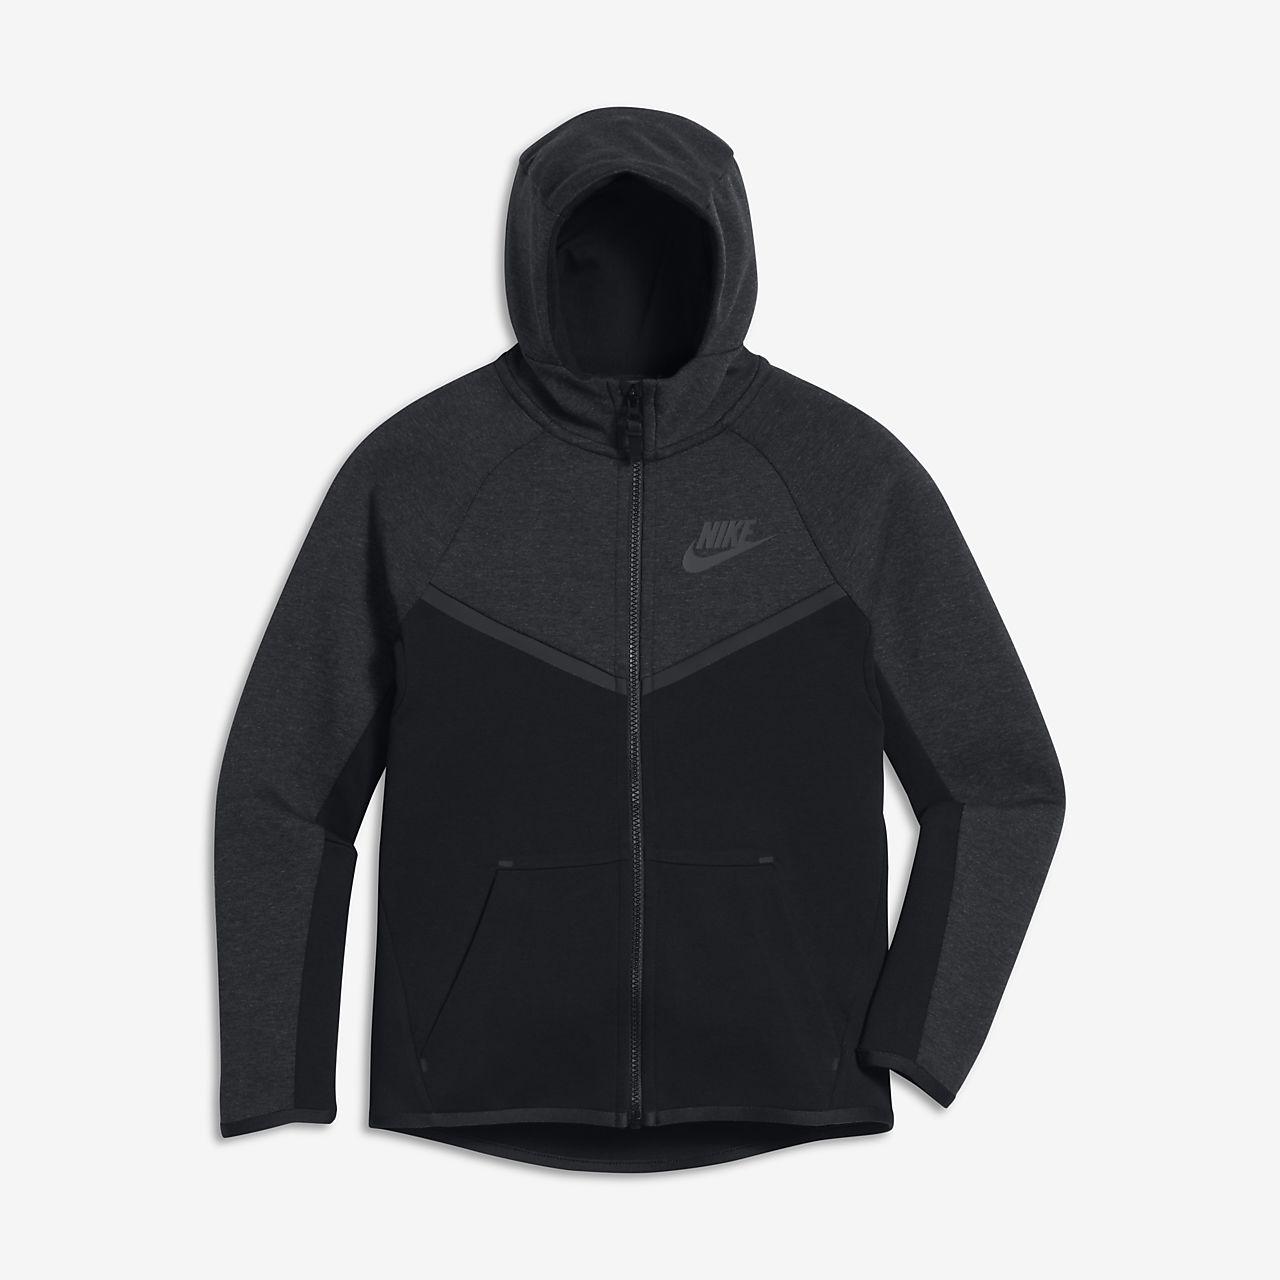 8946e8e385a10 ... Hoodie com fecho completo Nike Sportswear Tech Fleece Windrunner Júnior  (Rapaz)